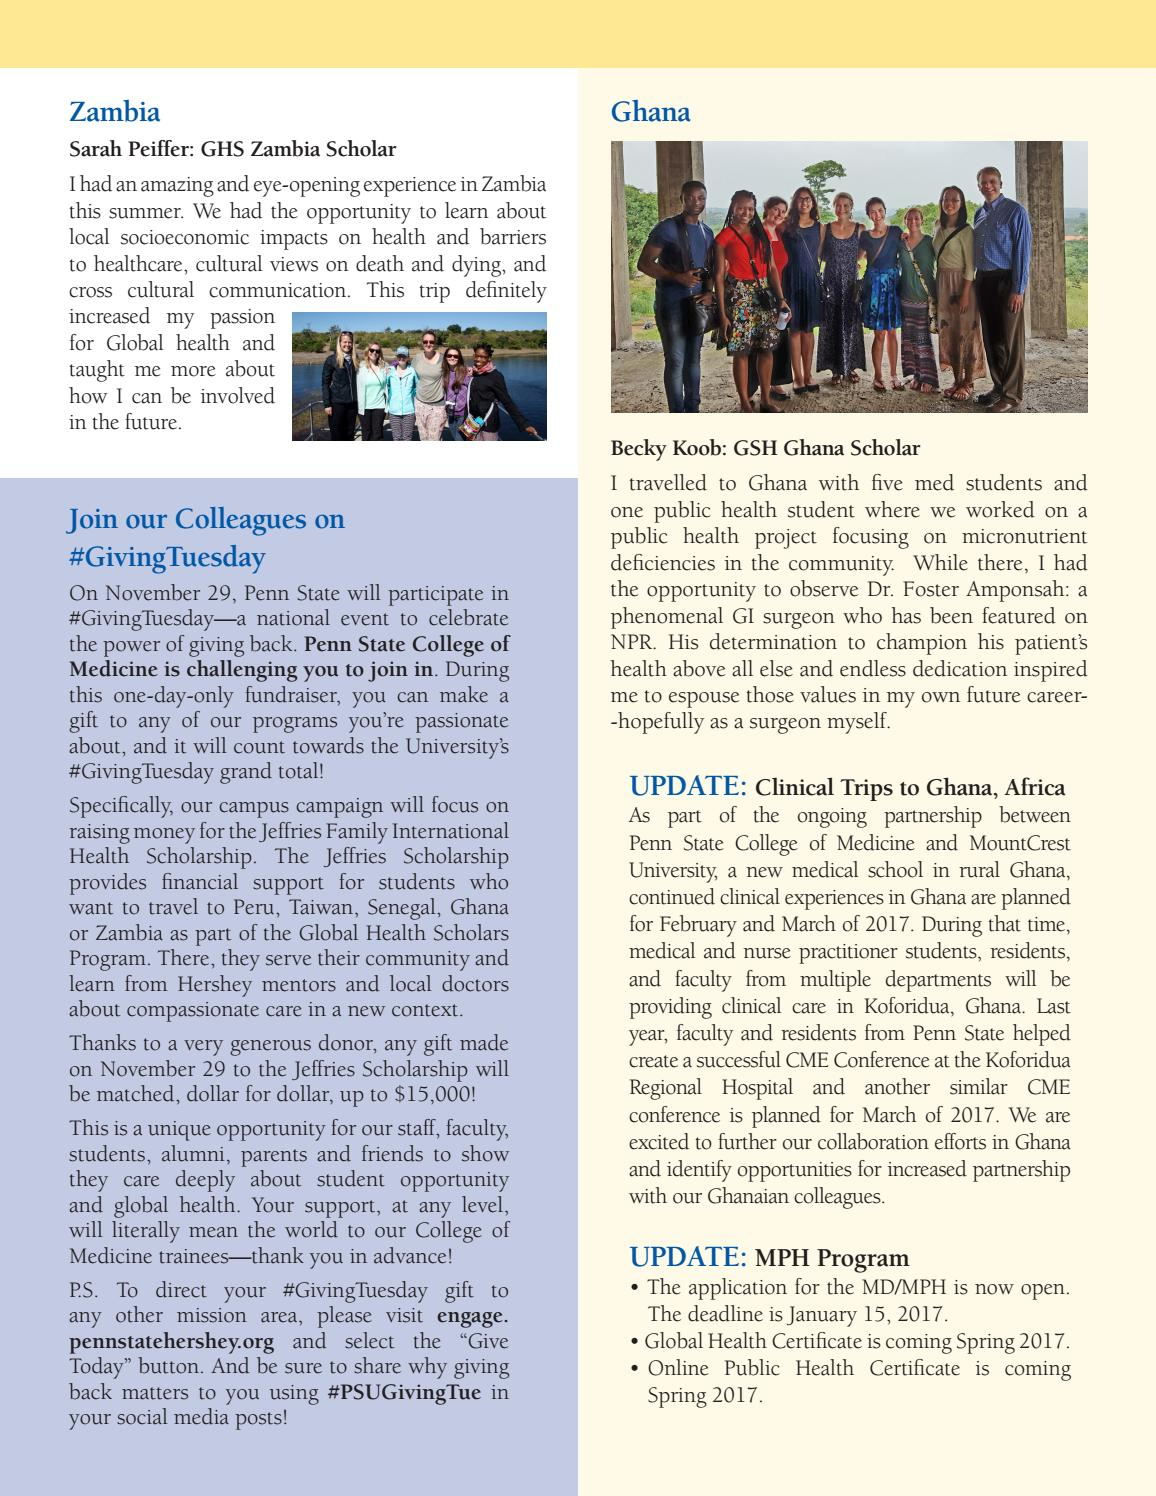 Global Health Newsletter Fall 2016 Psu Com By Ben Fredrick Issuu